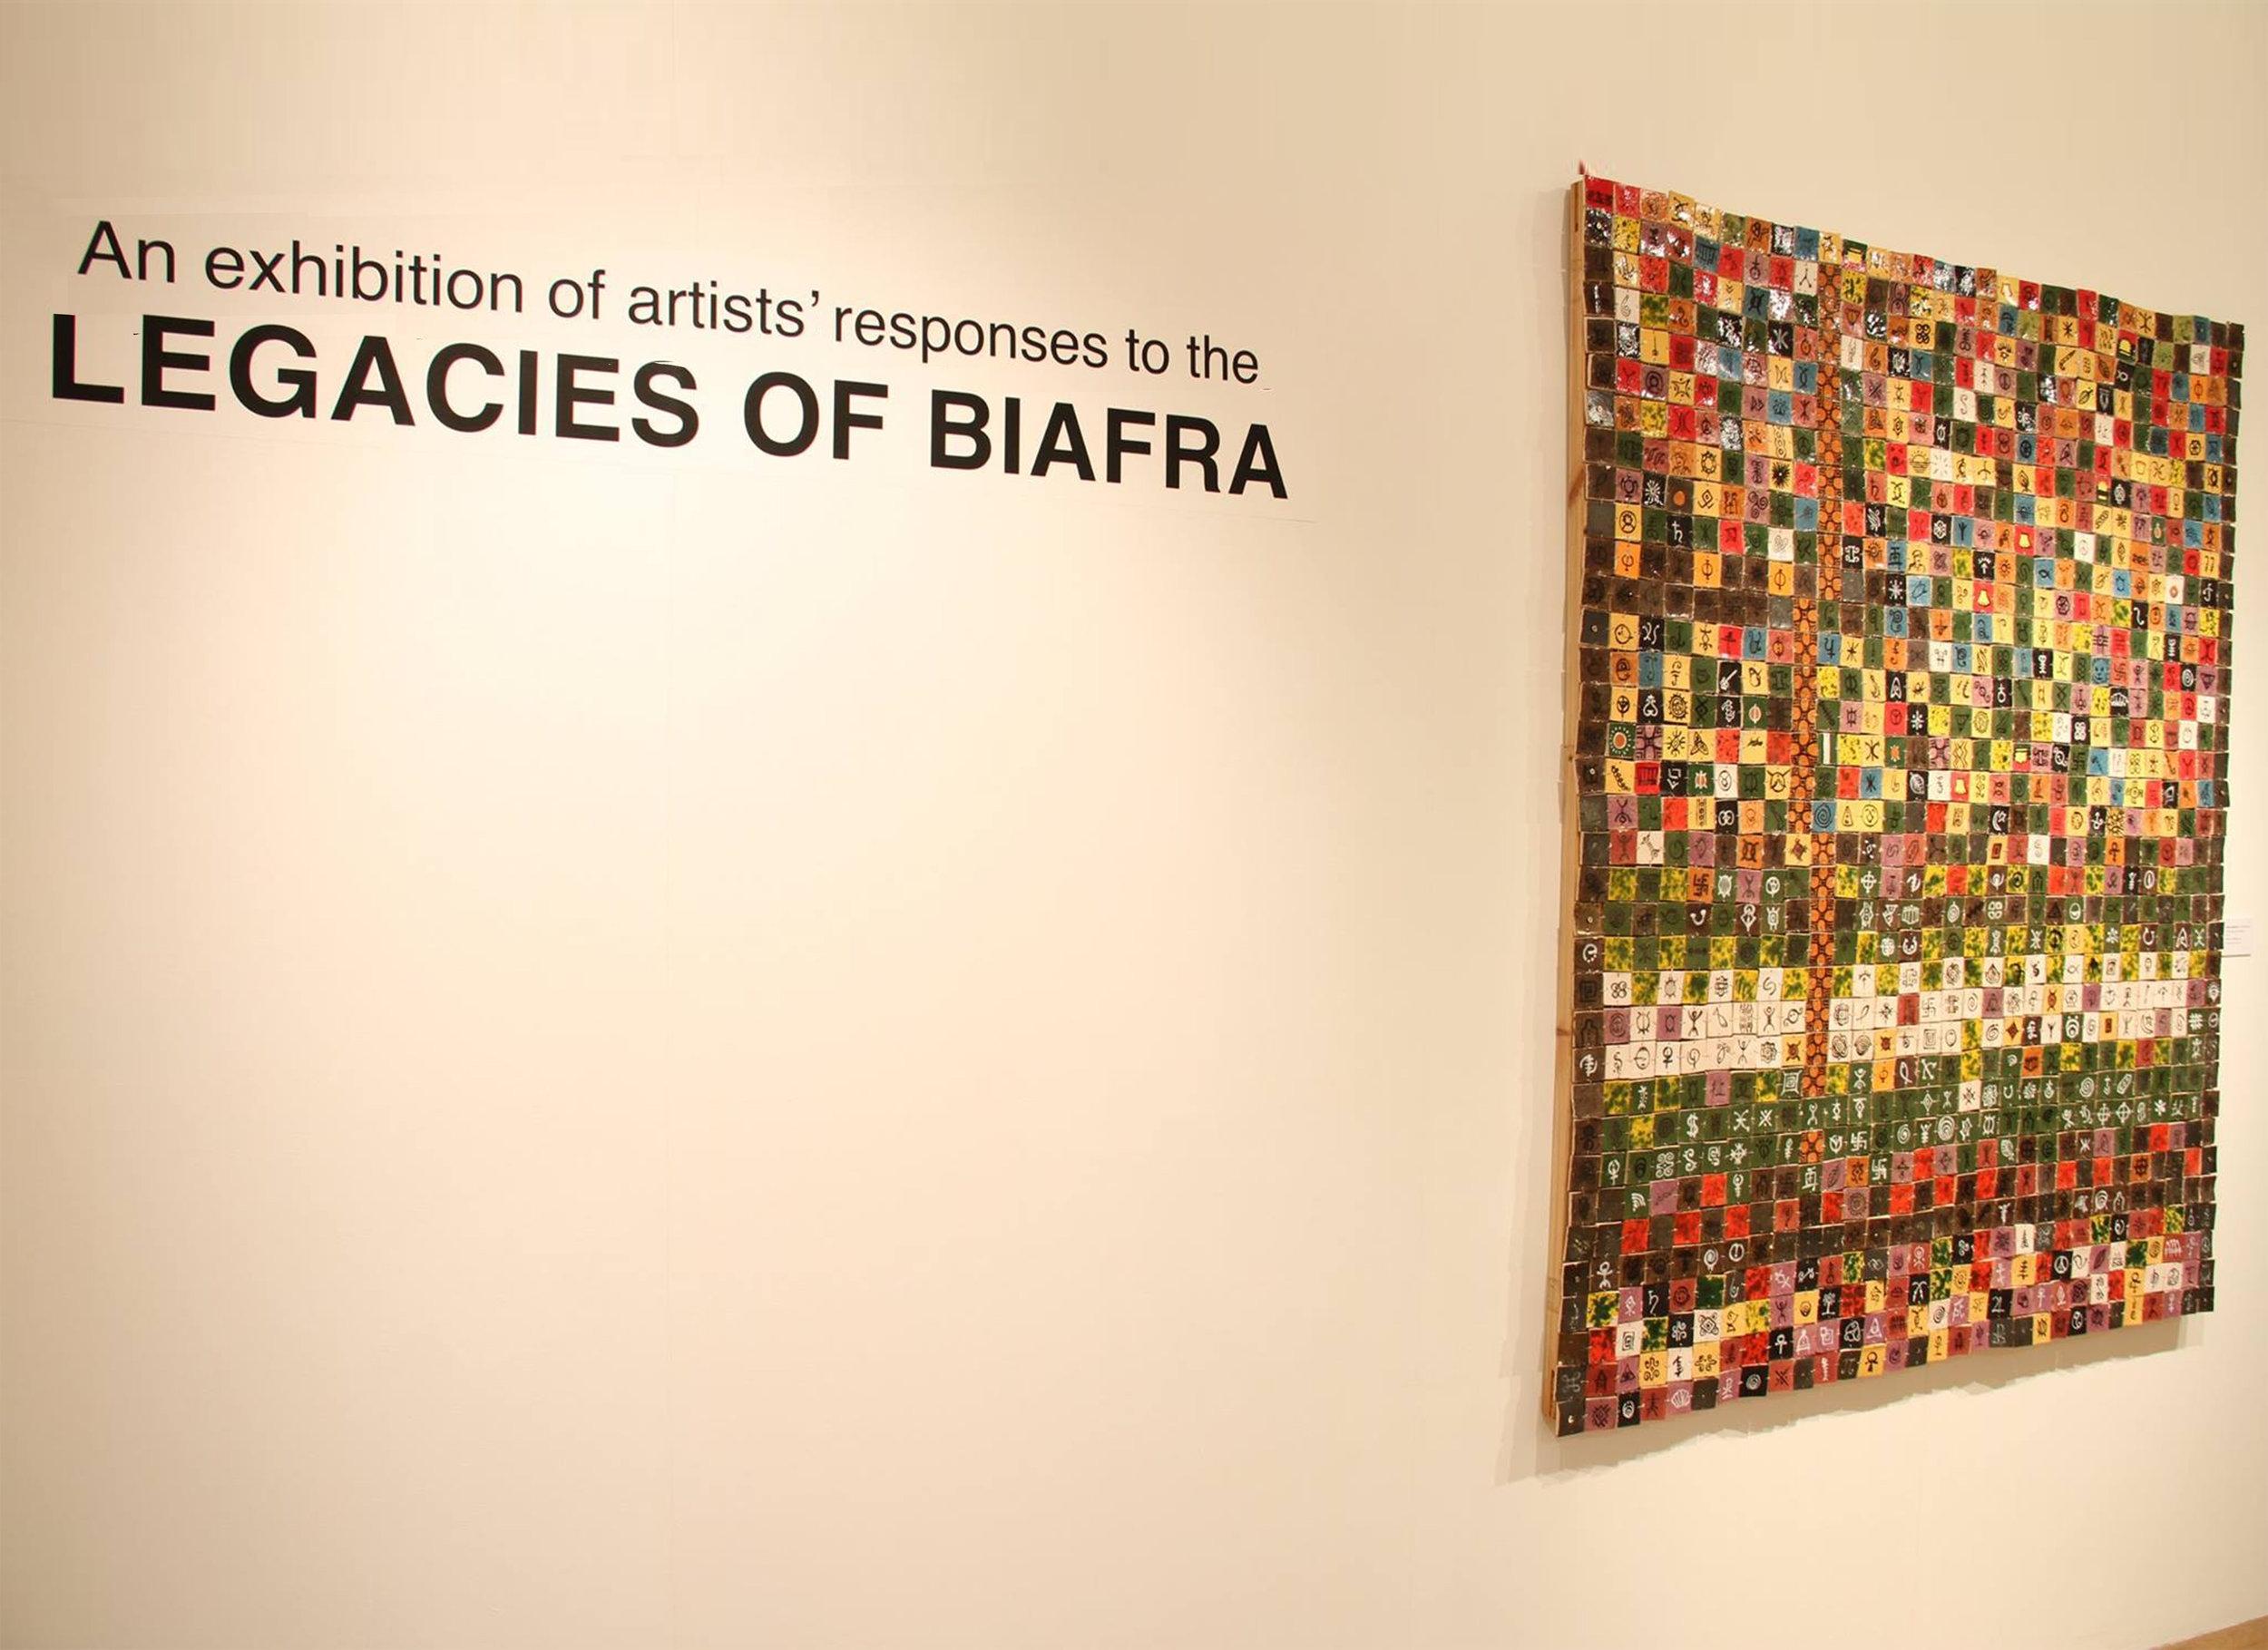 Biafra pics_0001_Biafra intro.jpg